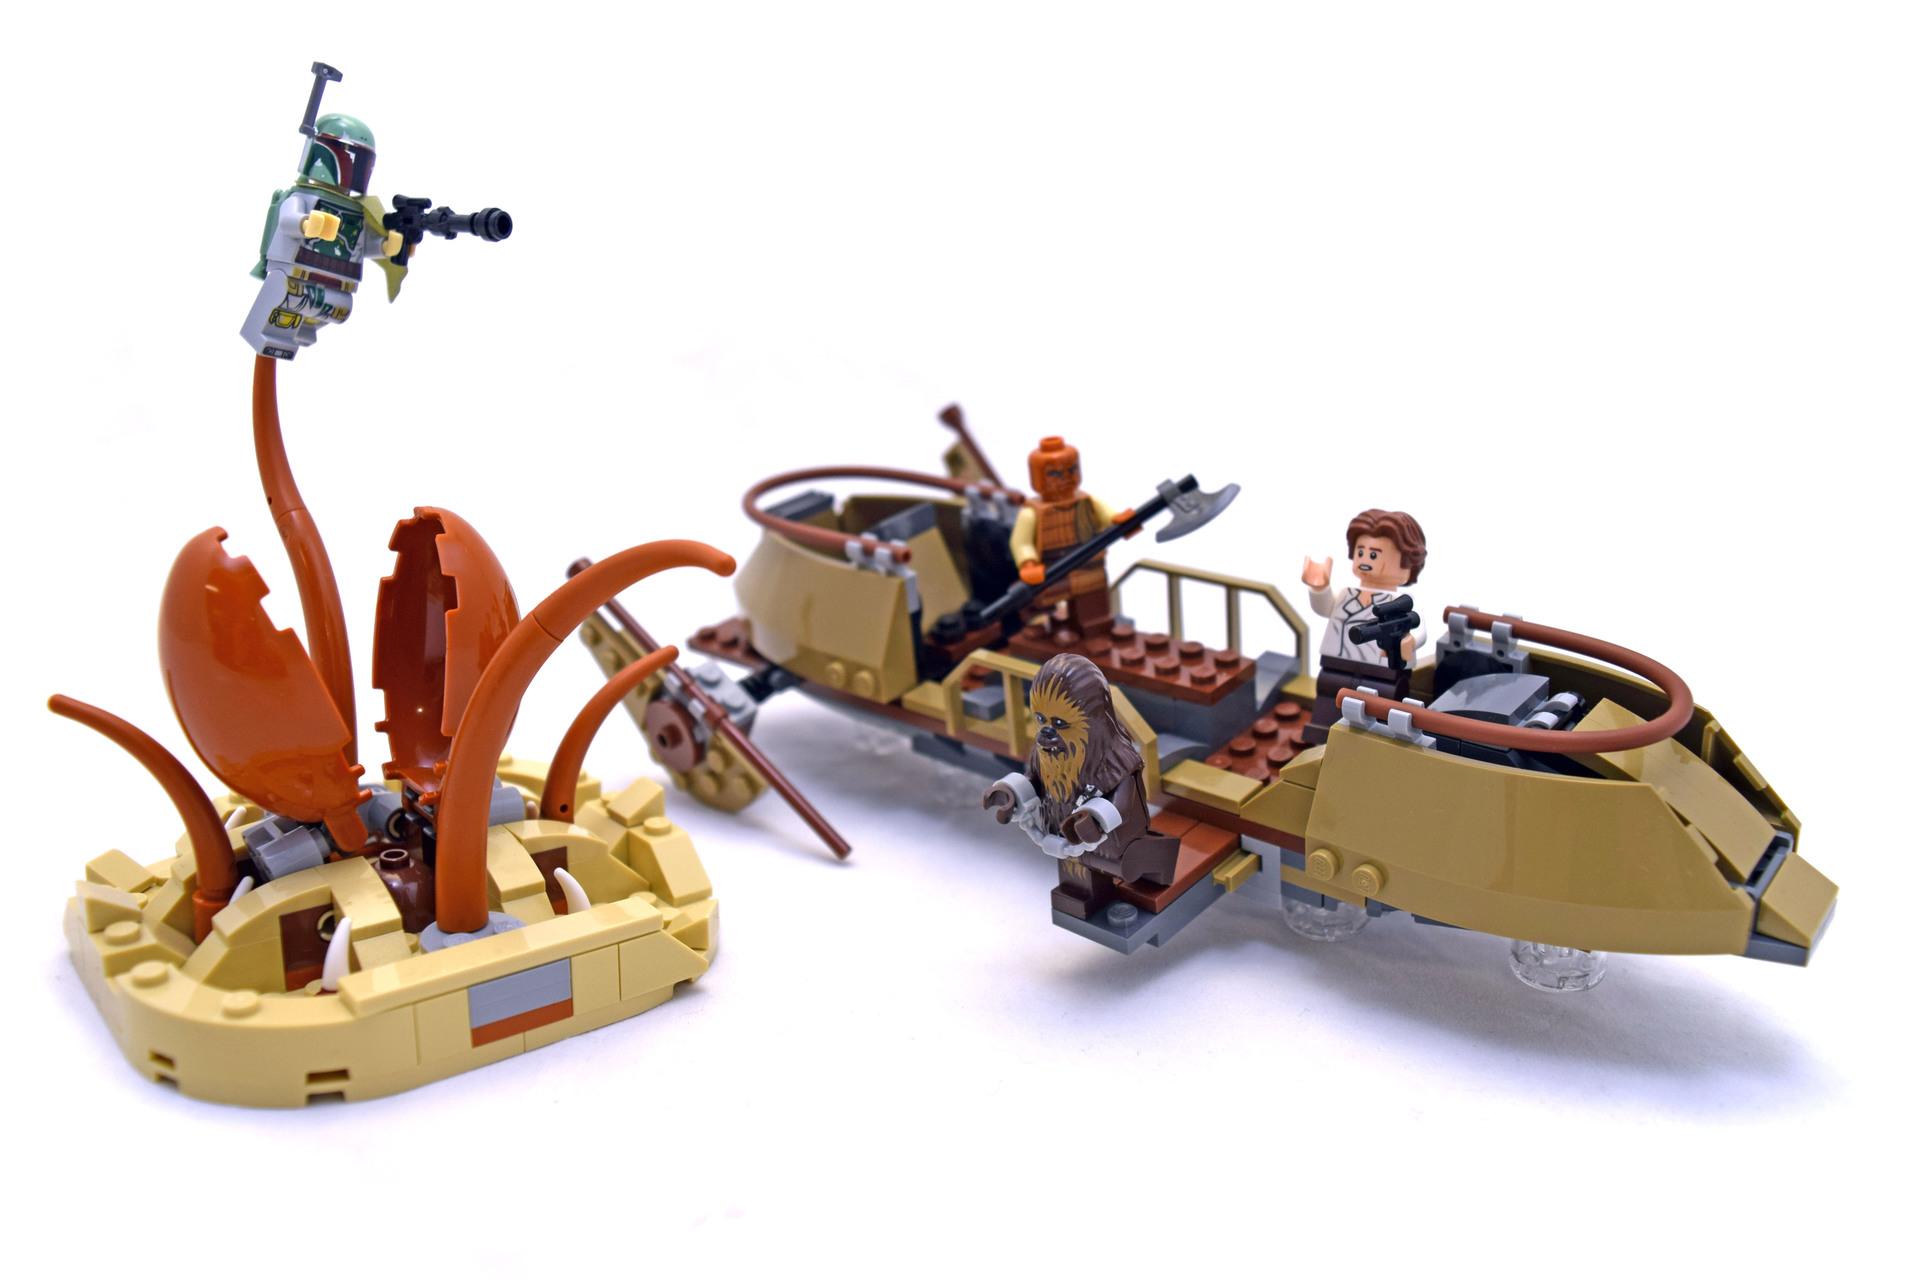 *NEW* from set 75174 Lego Star Wars Skiff Guard